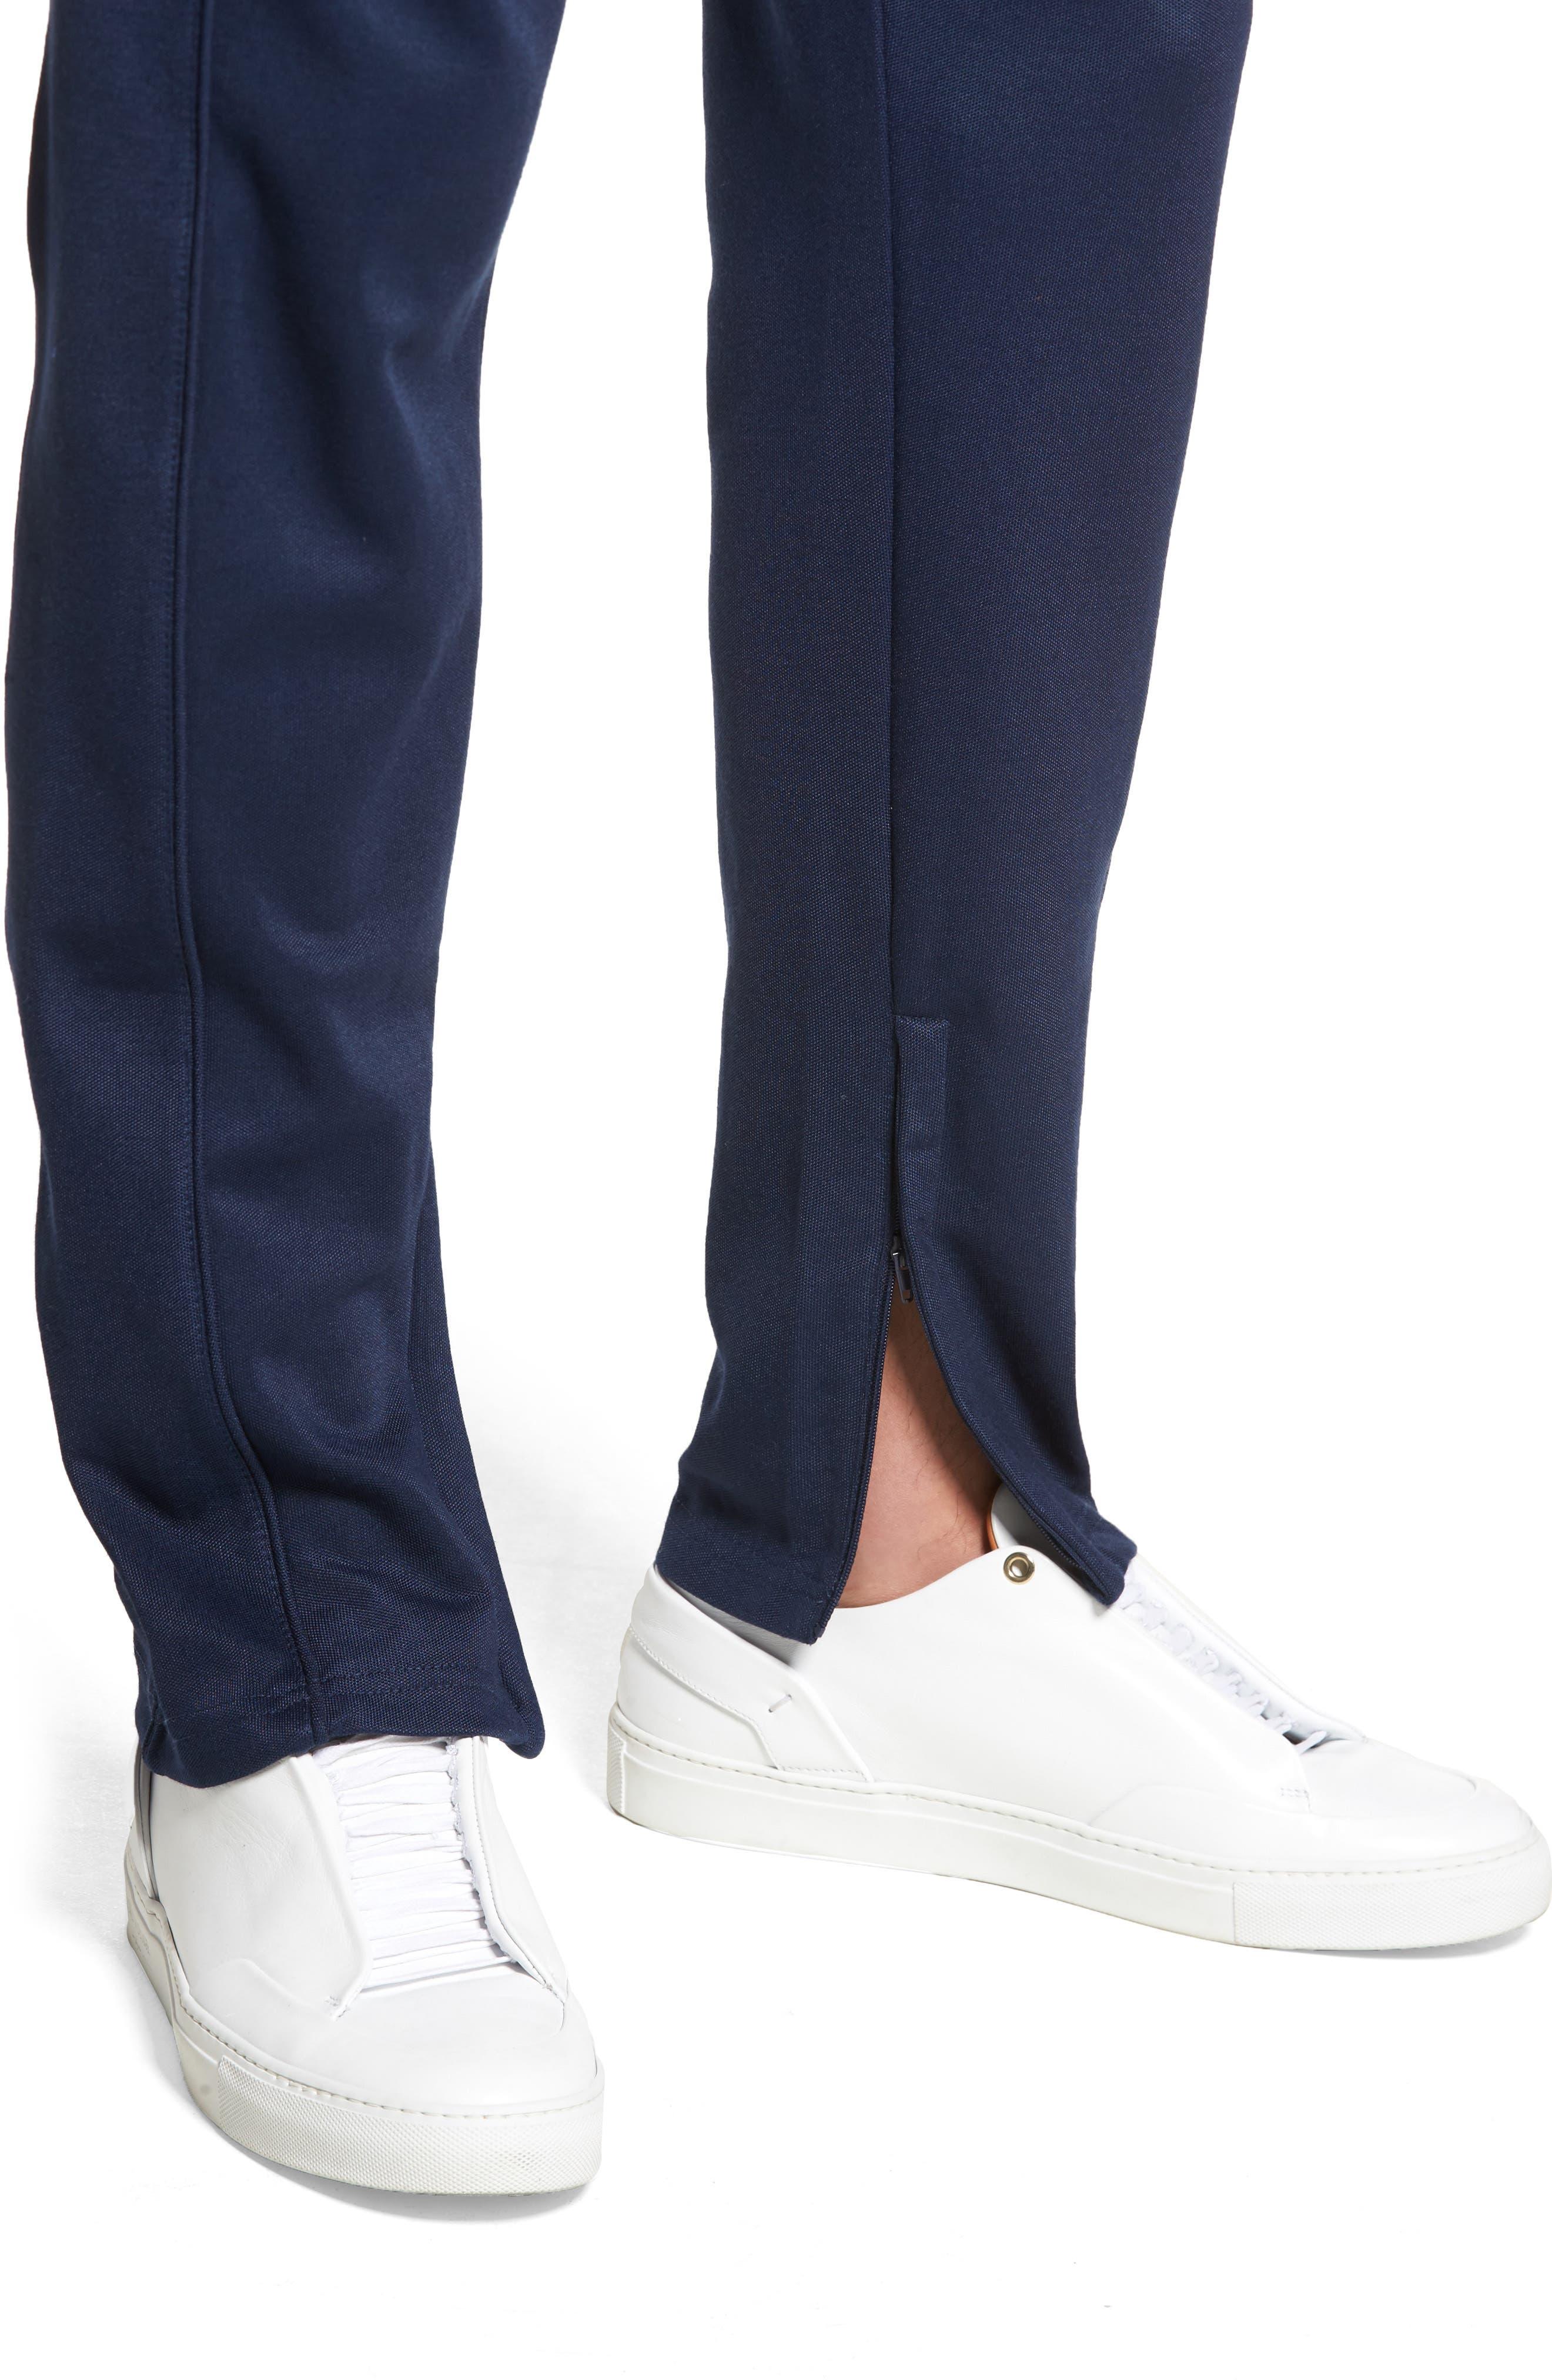 Bianchi Pants,                             Alternate thumbnail 8, color,